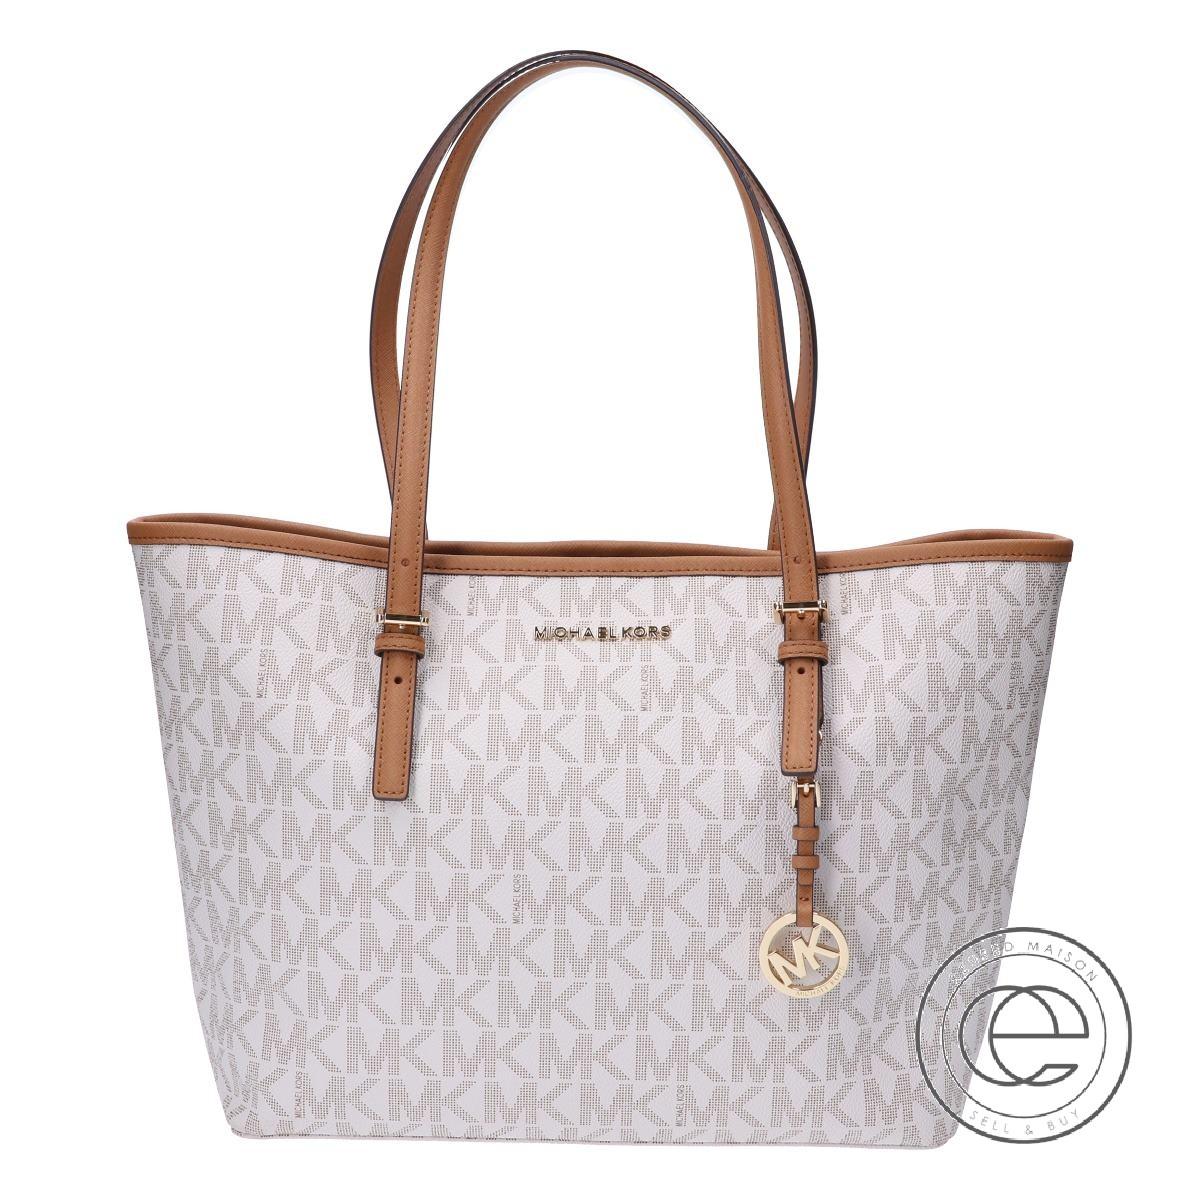 MICHAEL KORS Michael Kors 35H7GTVT2B signature leather tote bag VANILLA X ACORN Lady's